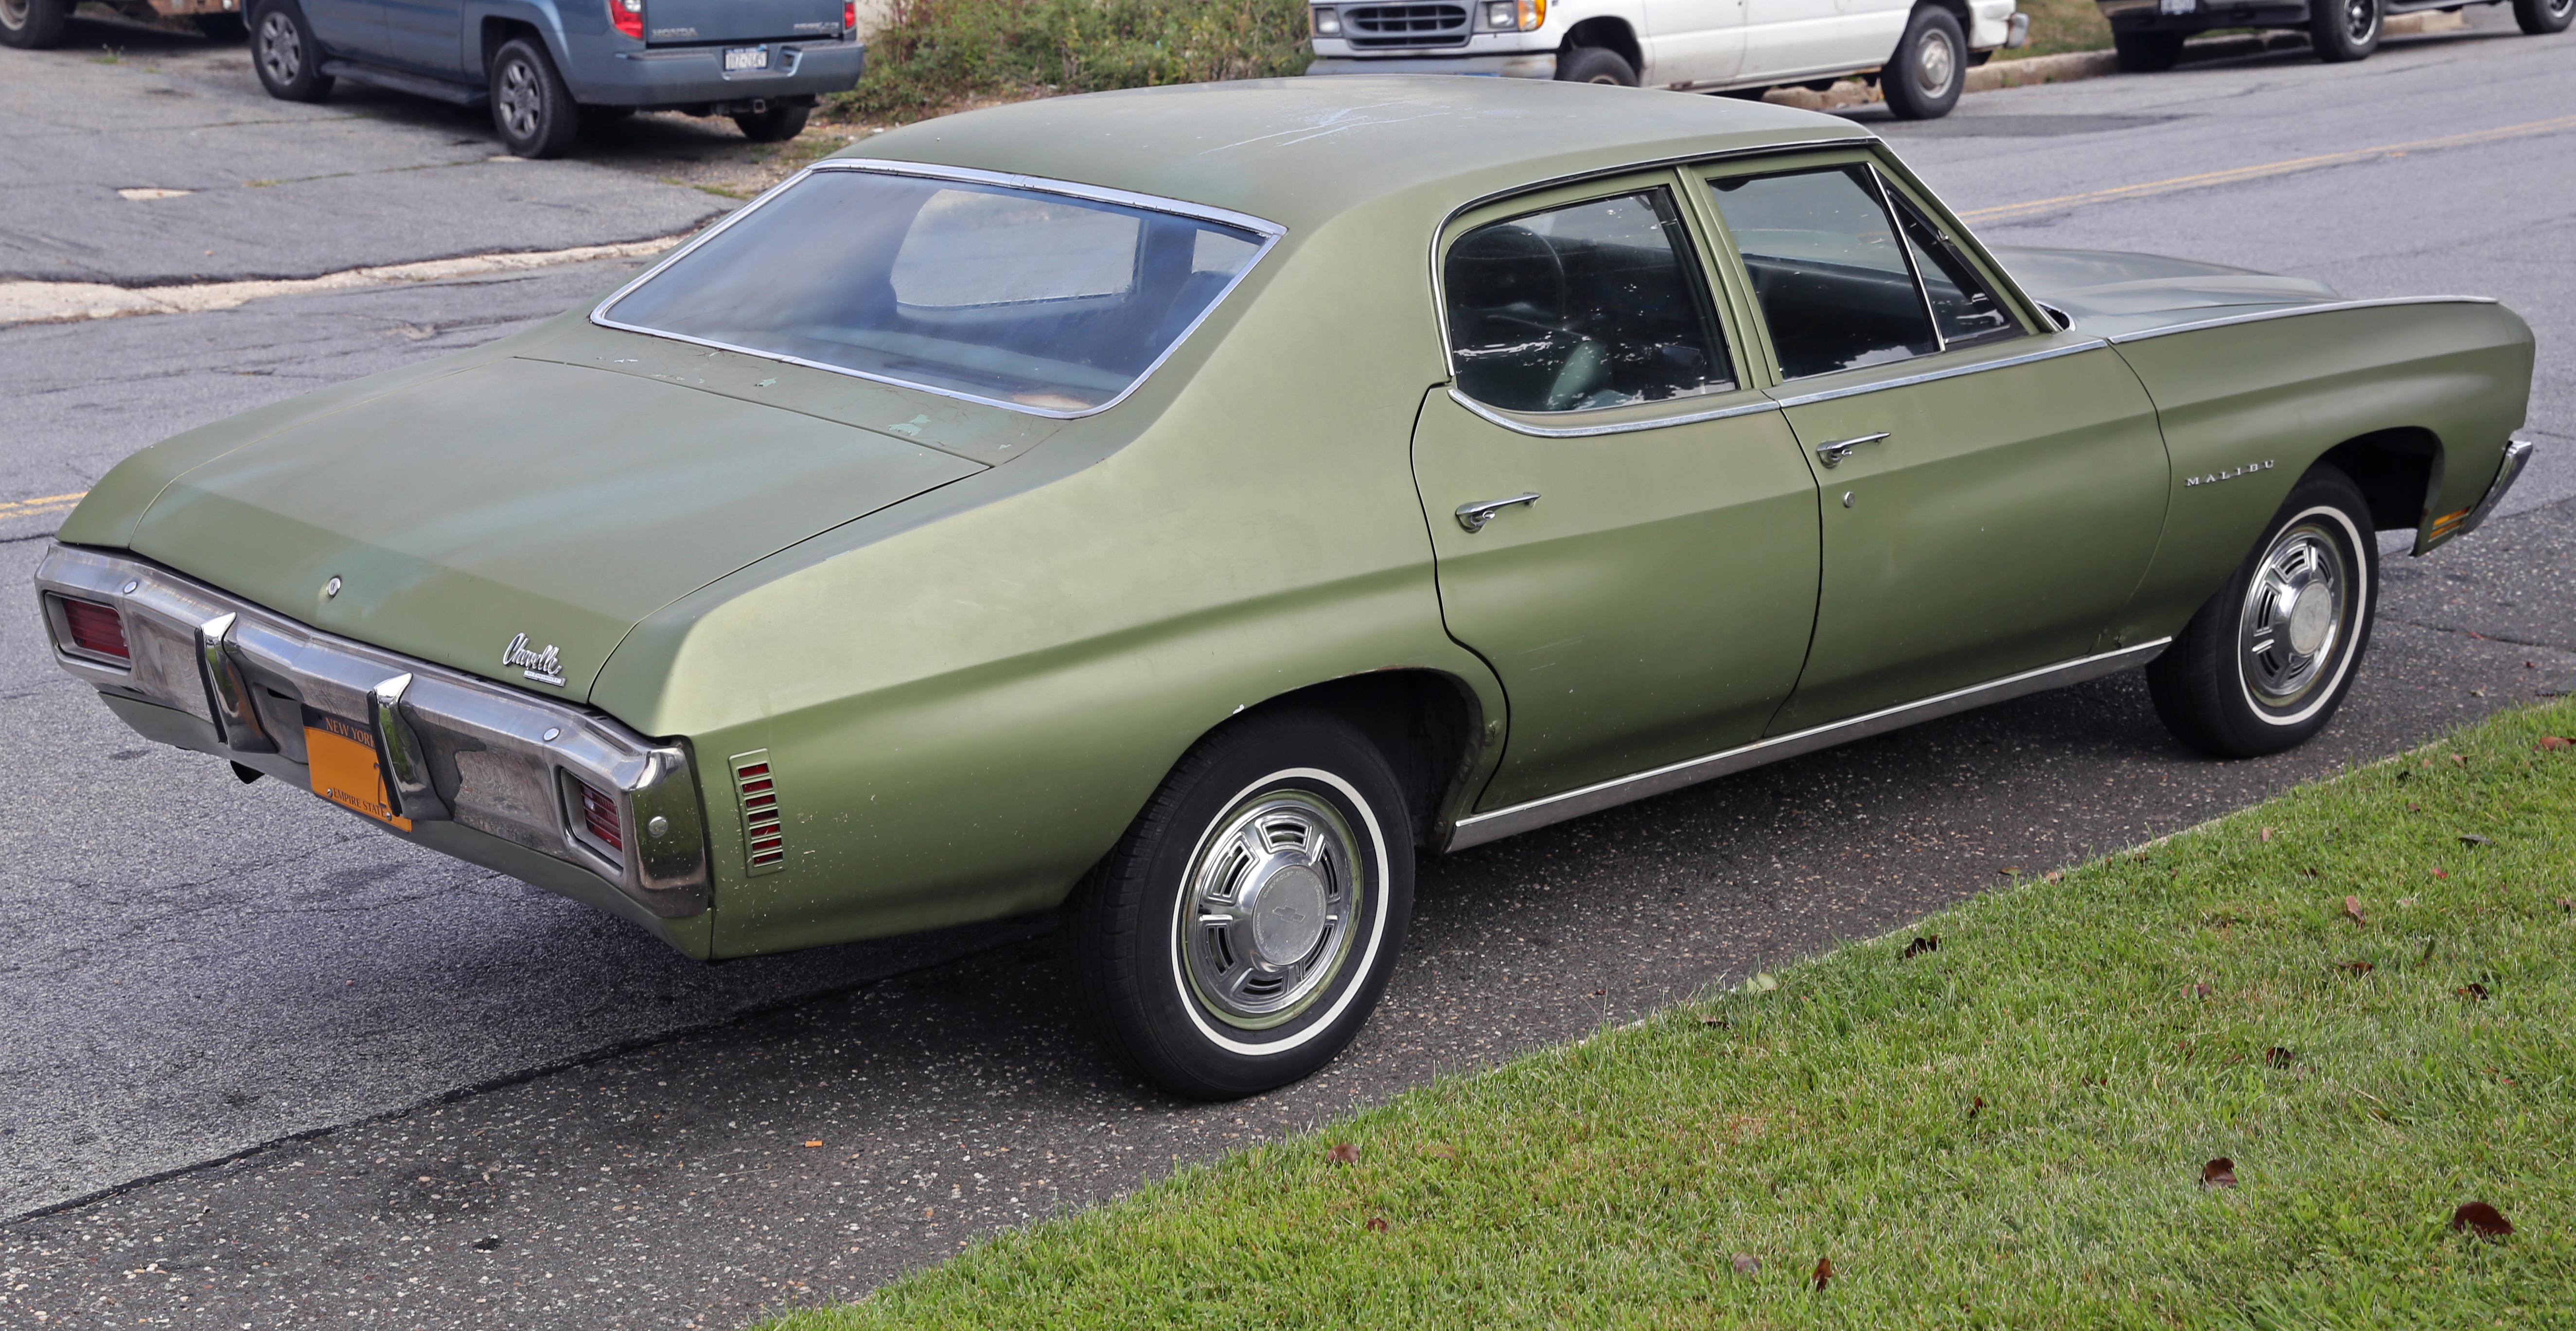 File:1970 Chevrolet Chevelle Malibu 4-dr, rear right.jpg - Wikimedia Commons